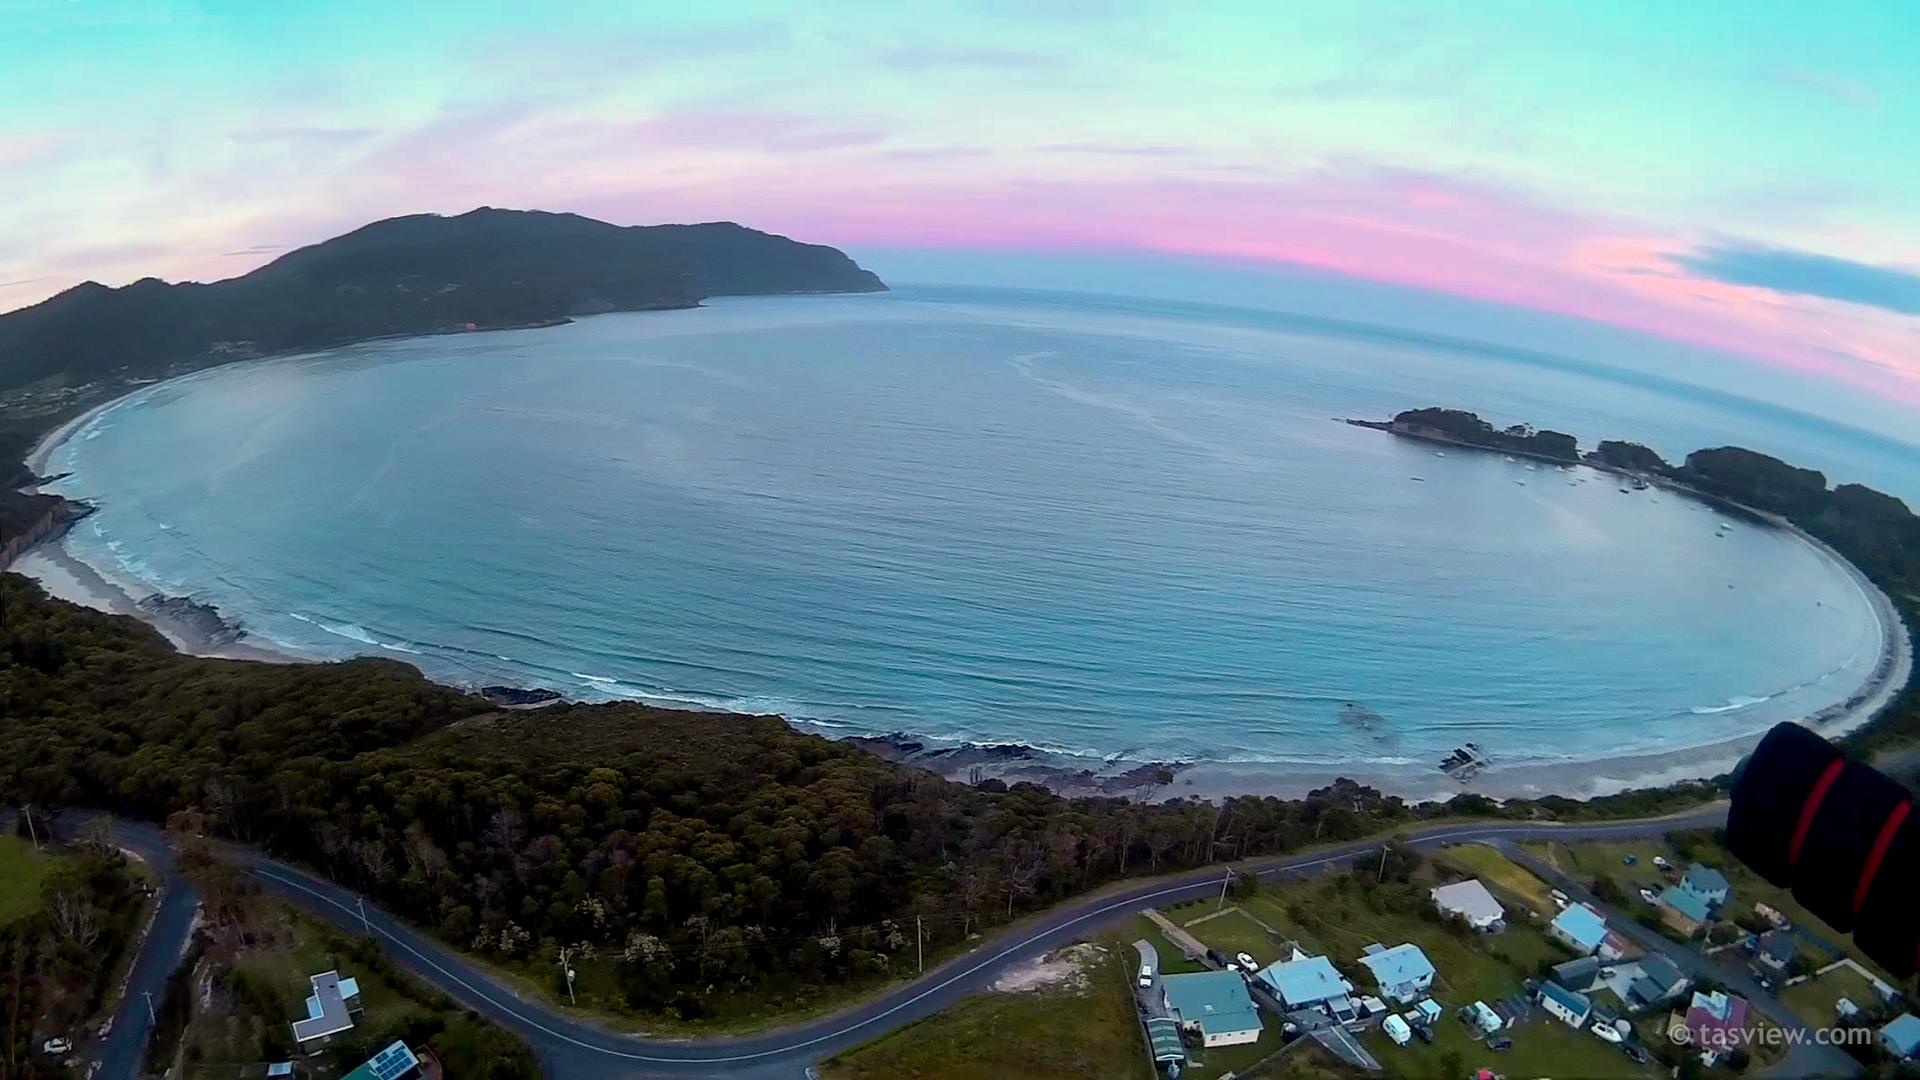 Eaglehawk Neck | Gateway to the Tasman Peninsula